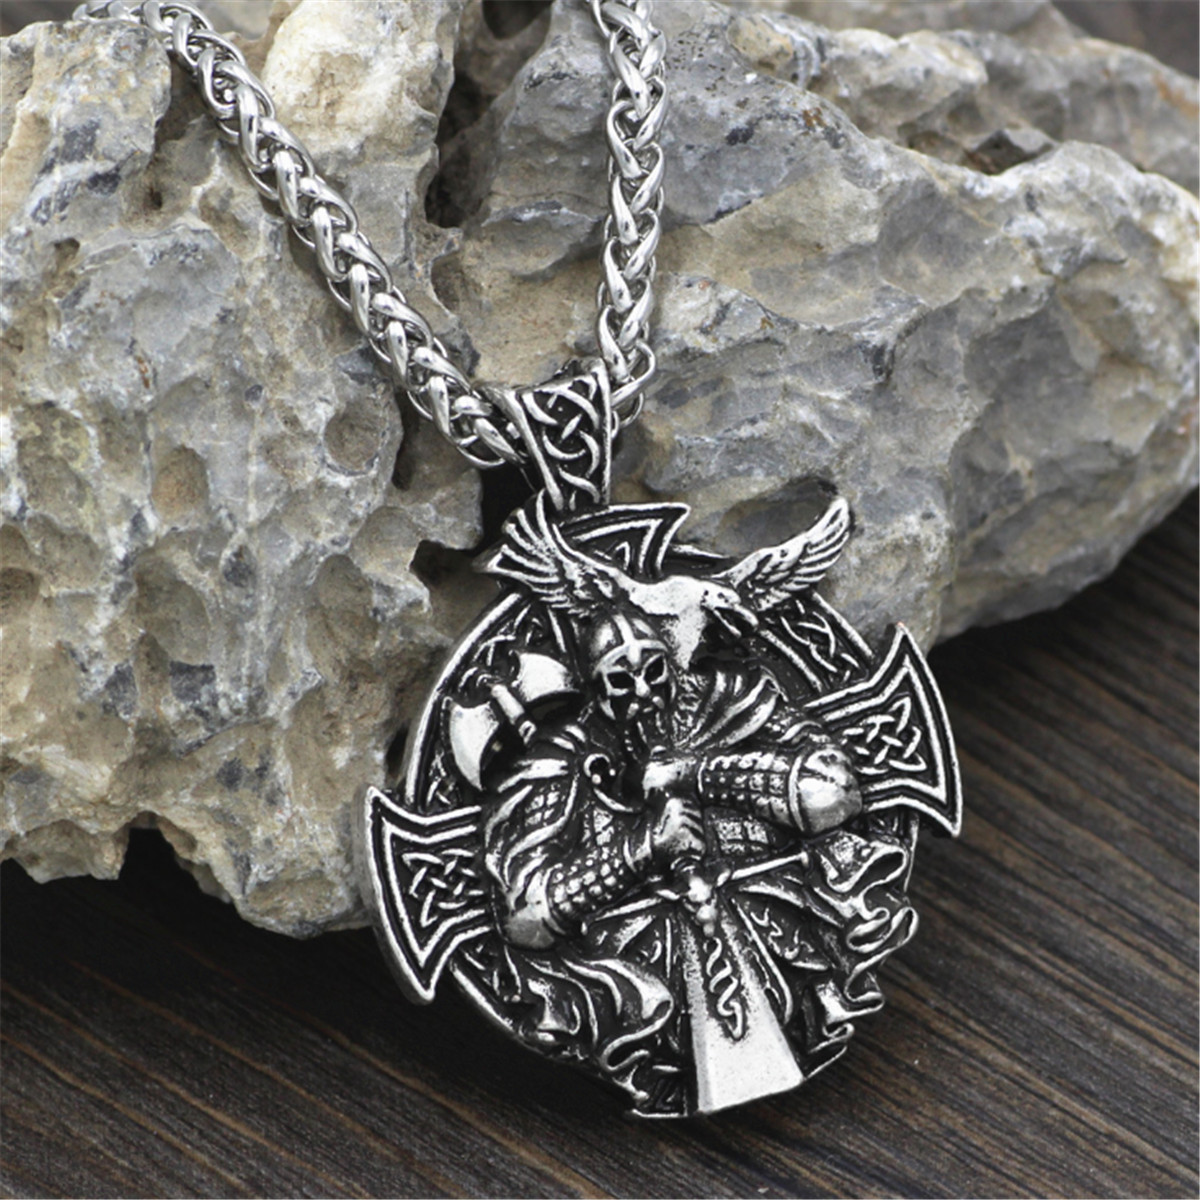 Edelstahl Wikinger Kette Odin Rune Raven Viking Schmuck Raben Anhänger Halskette